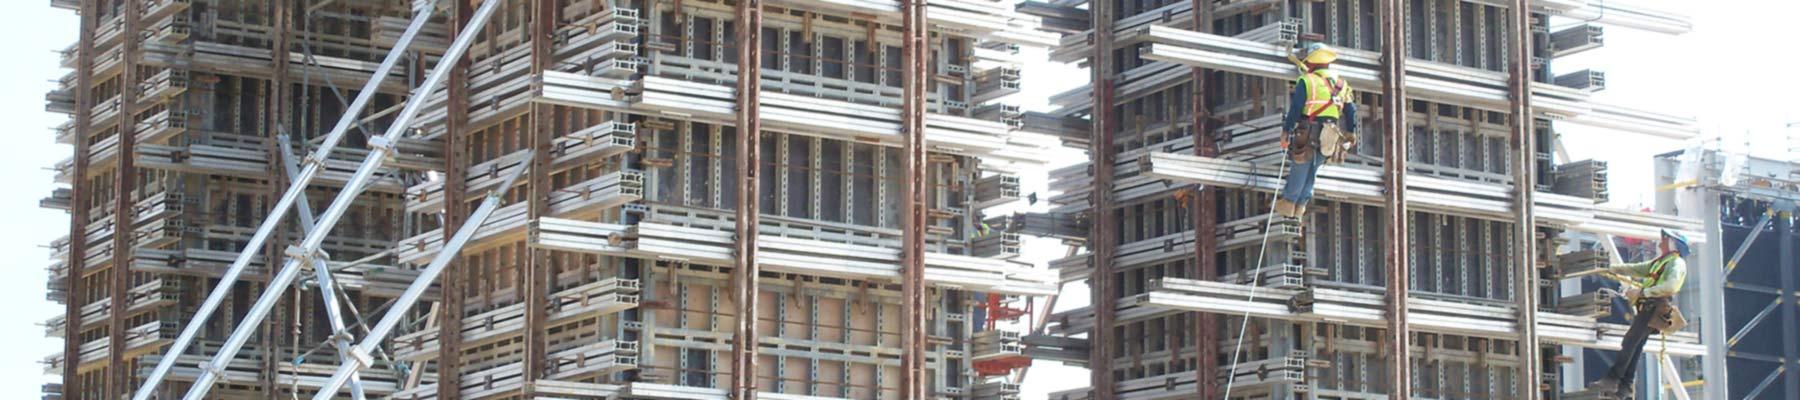 Concrete Forming & Shoring Services